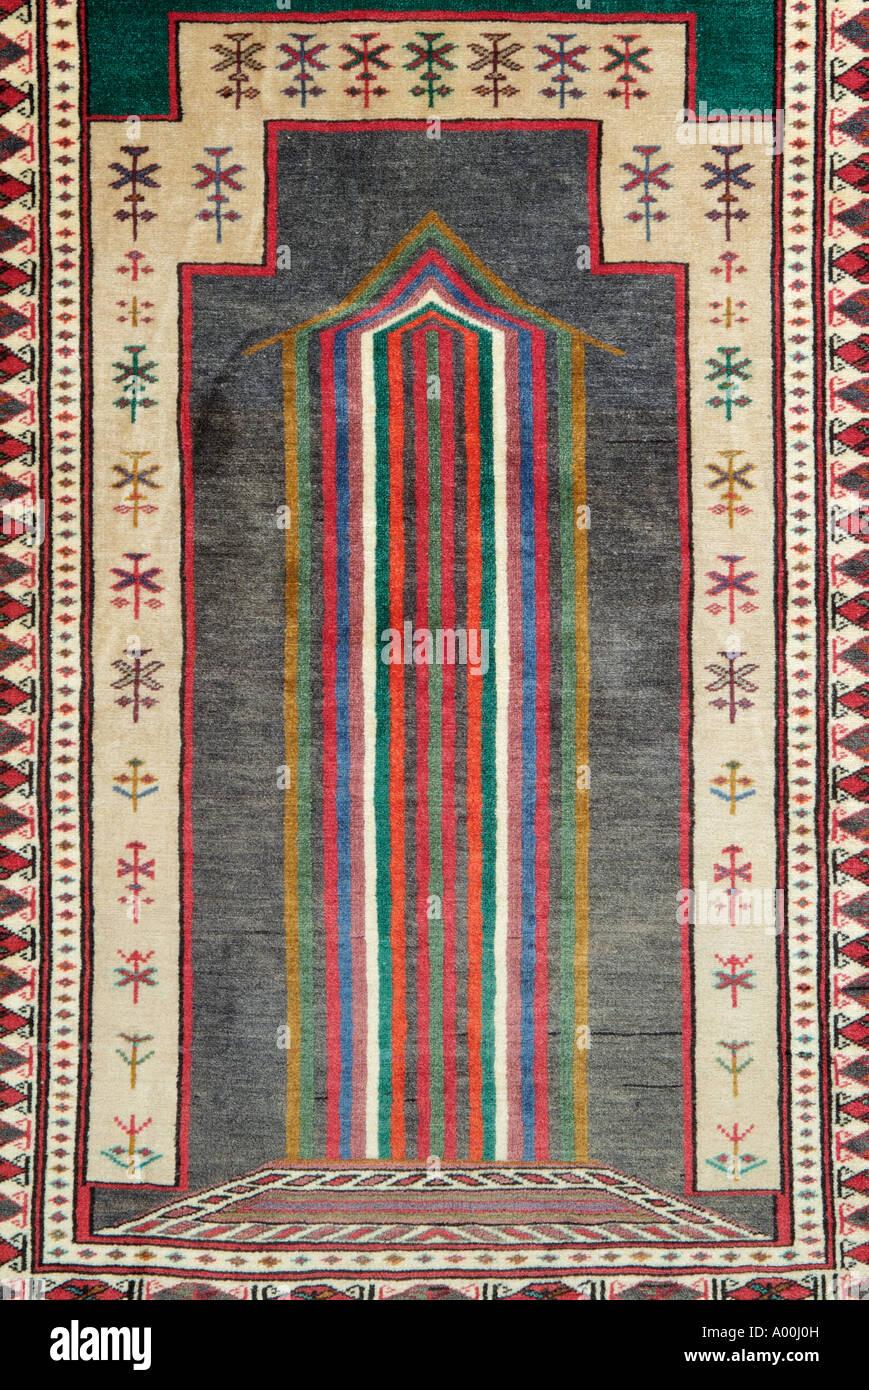 prayer religion Islam Islamic Moslem Carpet rug Iran Iranian Persia Persian near Middle East regional region Asia minor north ea - Stock Image